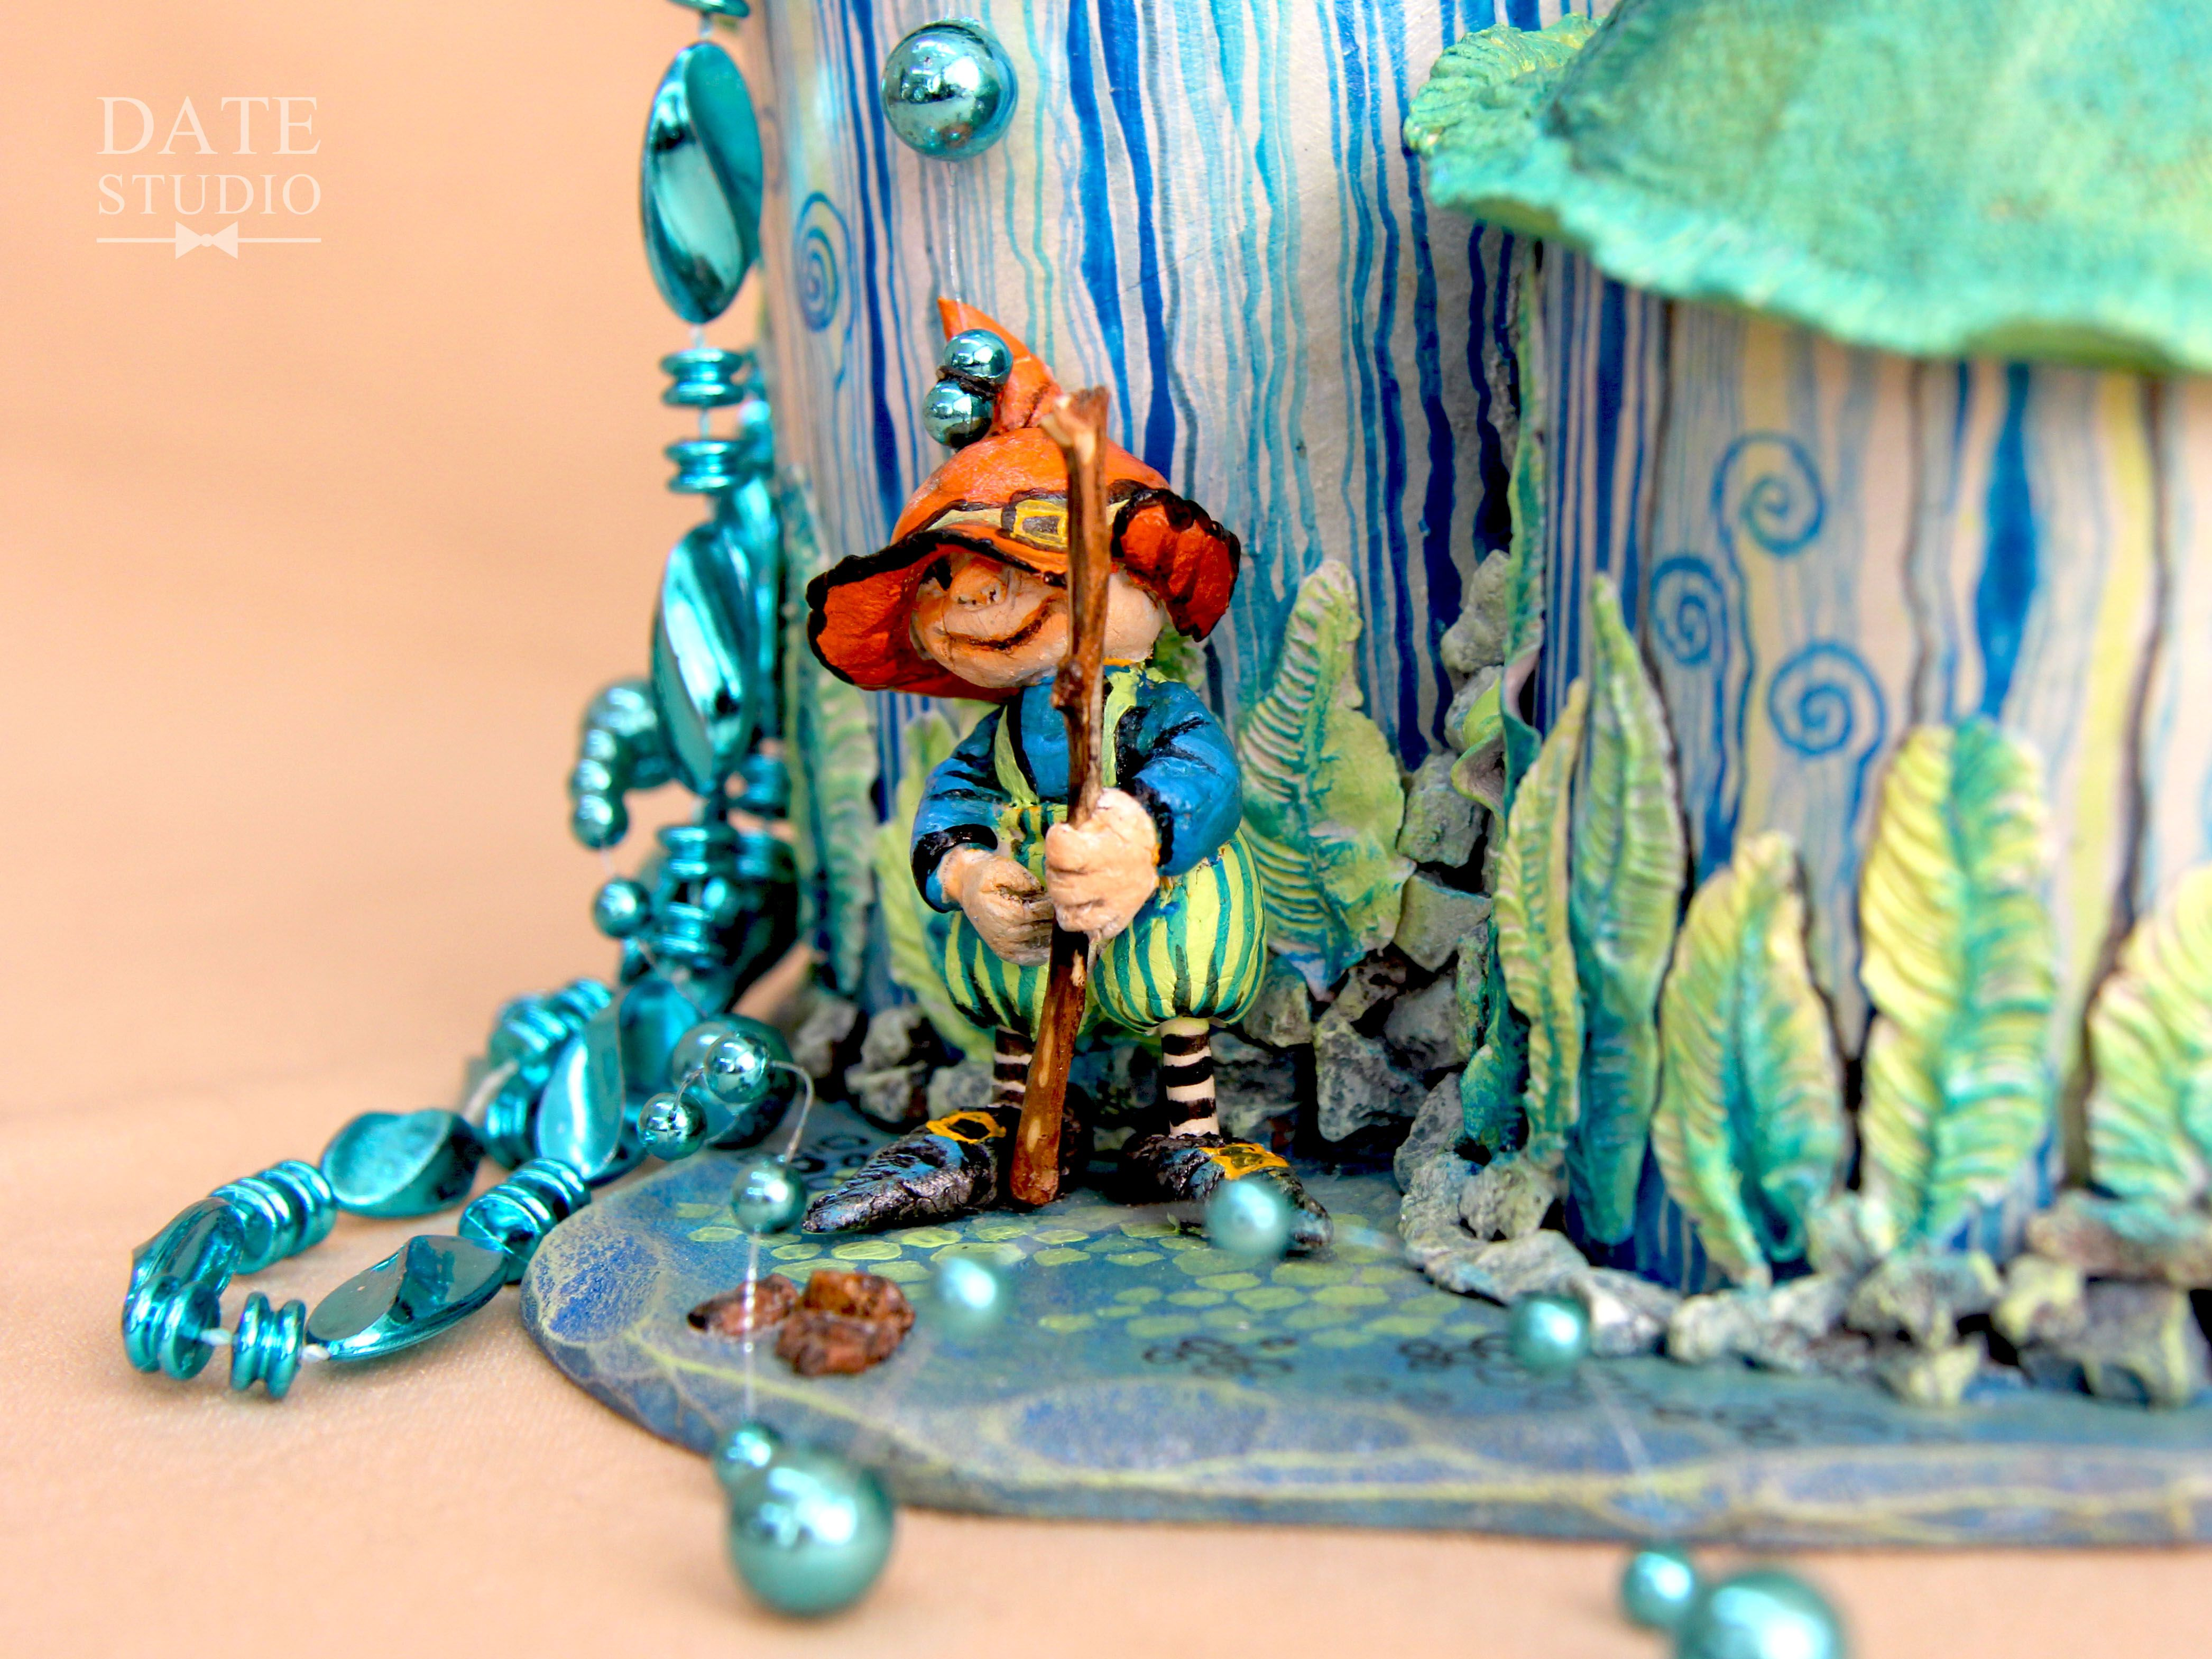 детали декор шкатулка бижутерия женщине интерьер гномик девушке подарок